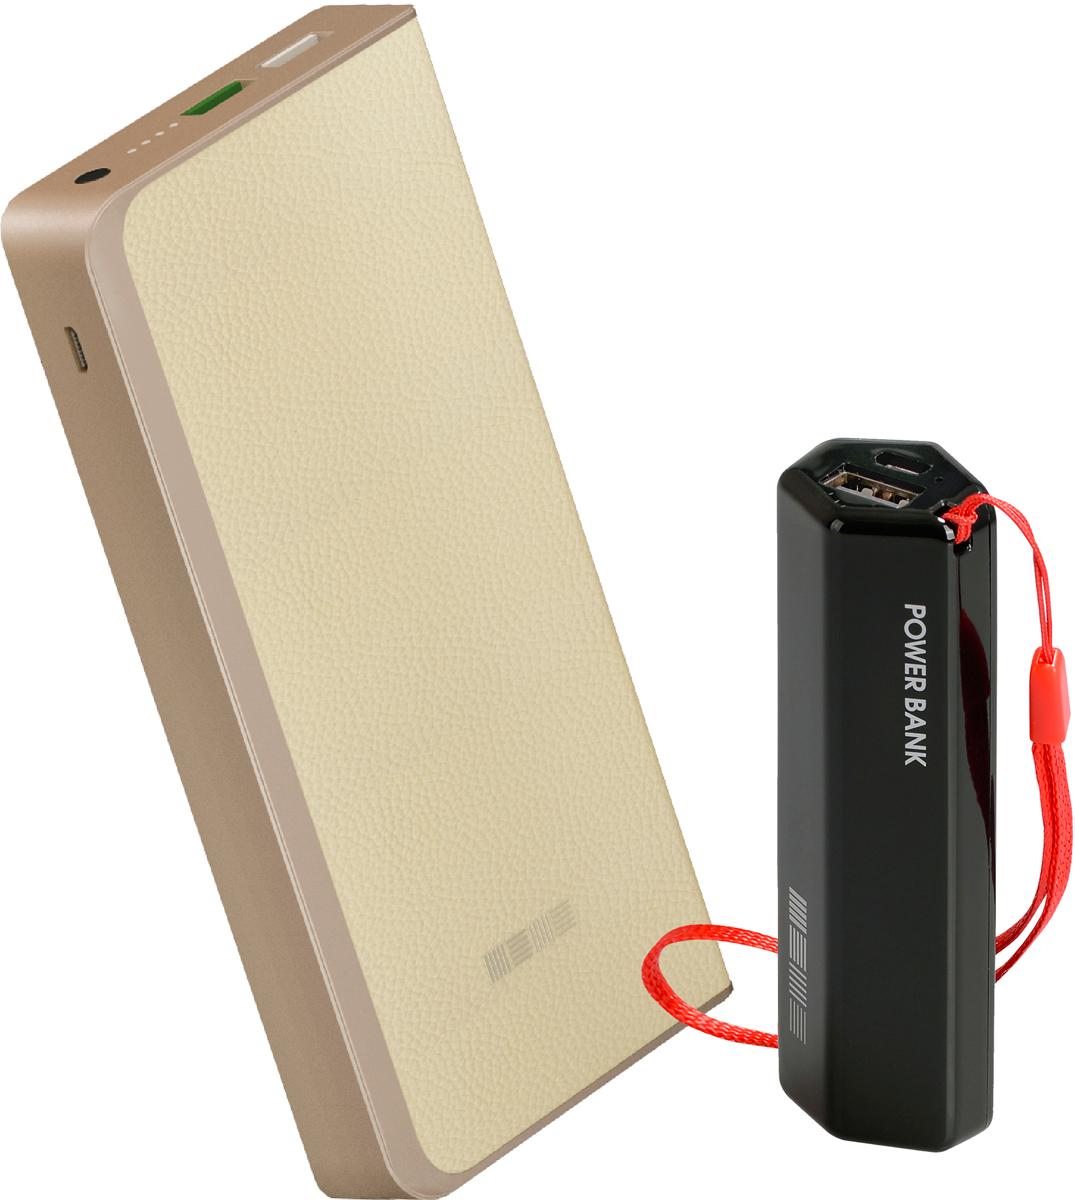 Interstep PB12000QC (12000 мАч), Beige + PB30001 (3000 мАч) комплект внешних аккумуляторов внешний аккумулятор interstep pb15000qc4u is ak pb158qc4u 000b210 15000 mah